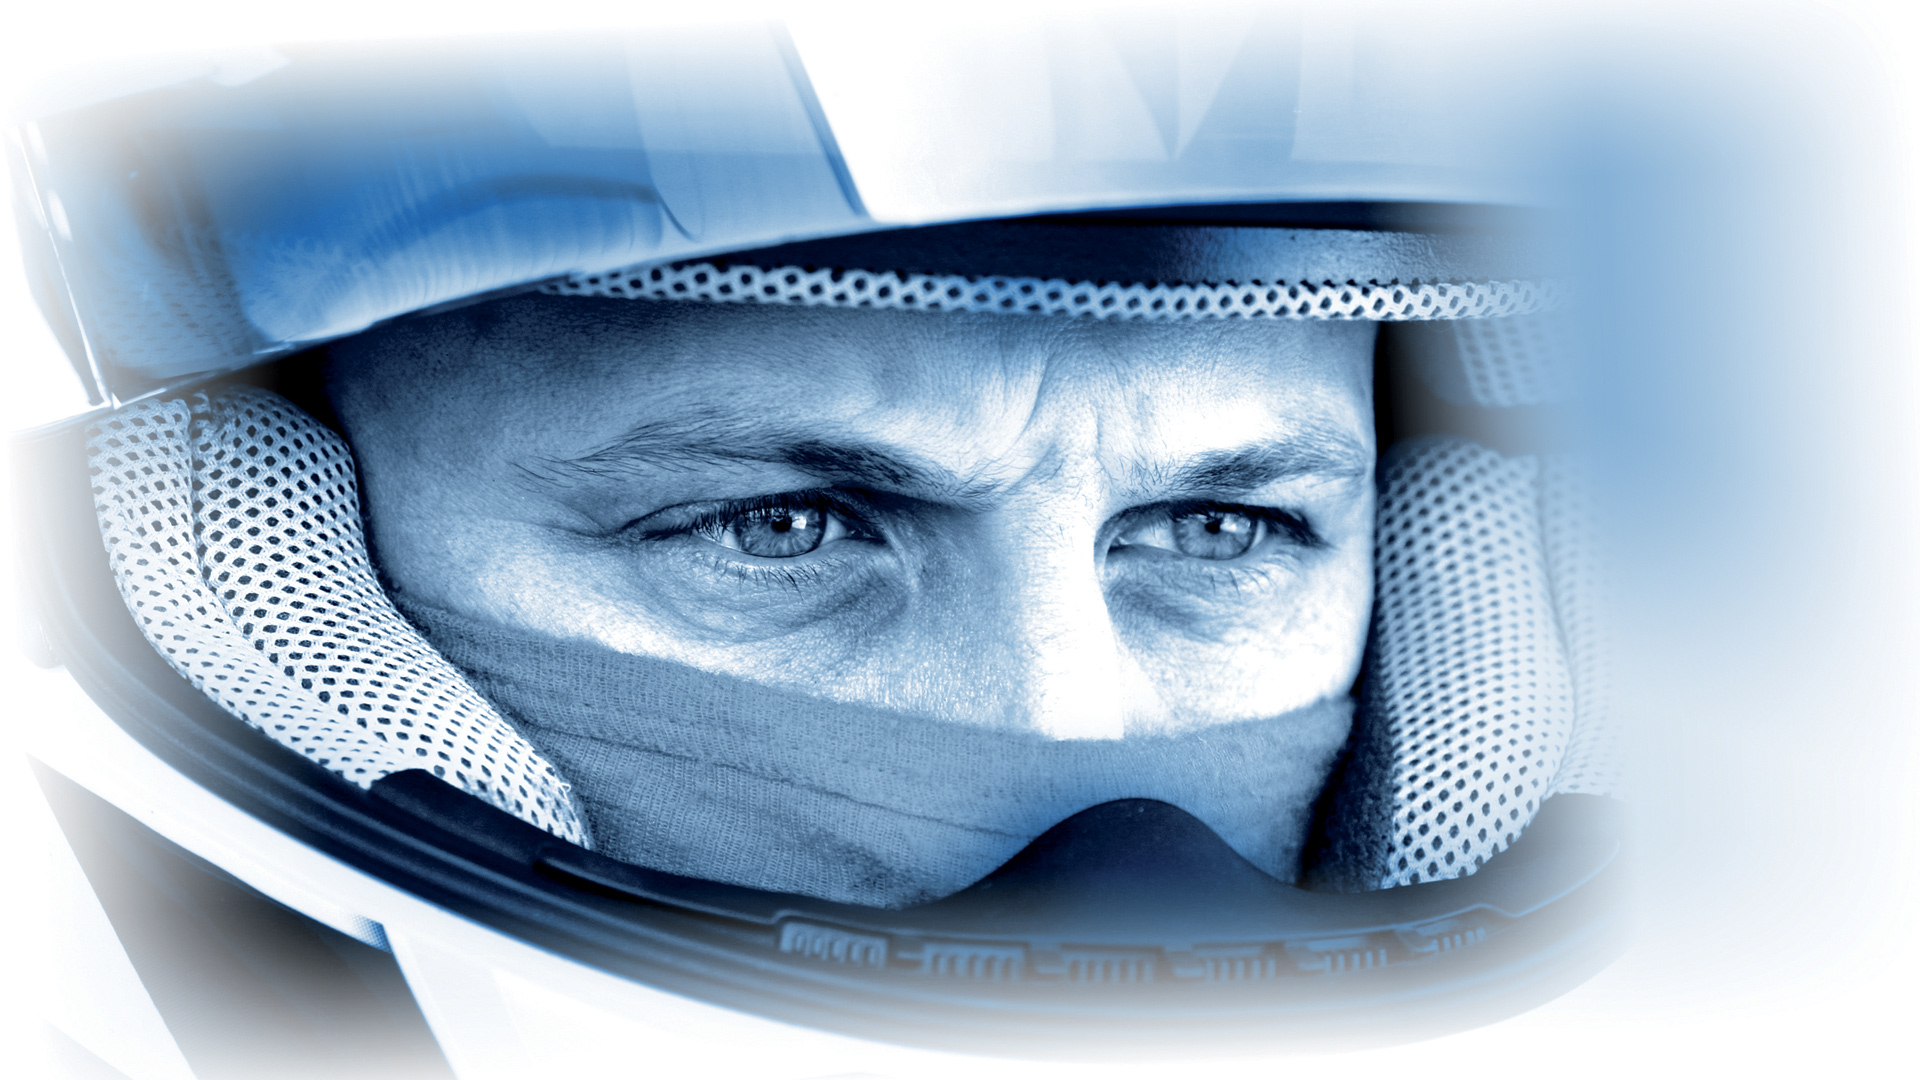 Motorsport data acquisition